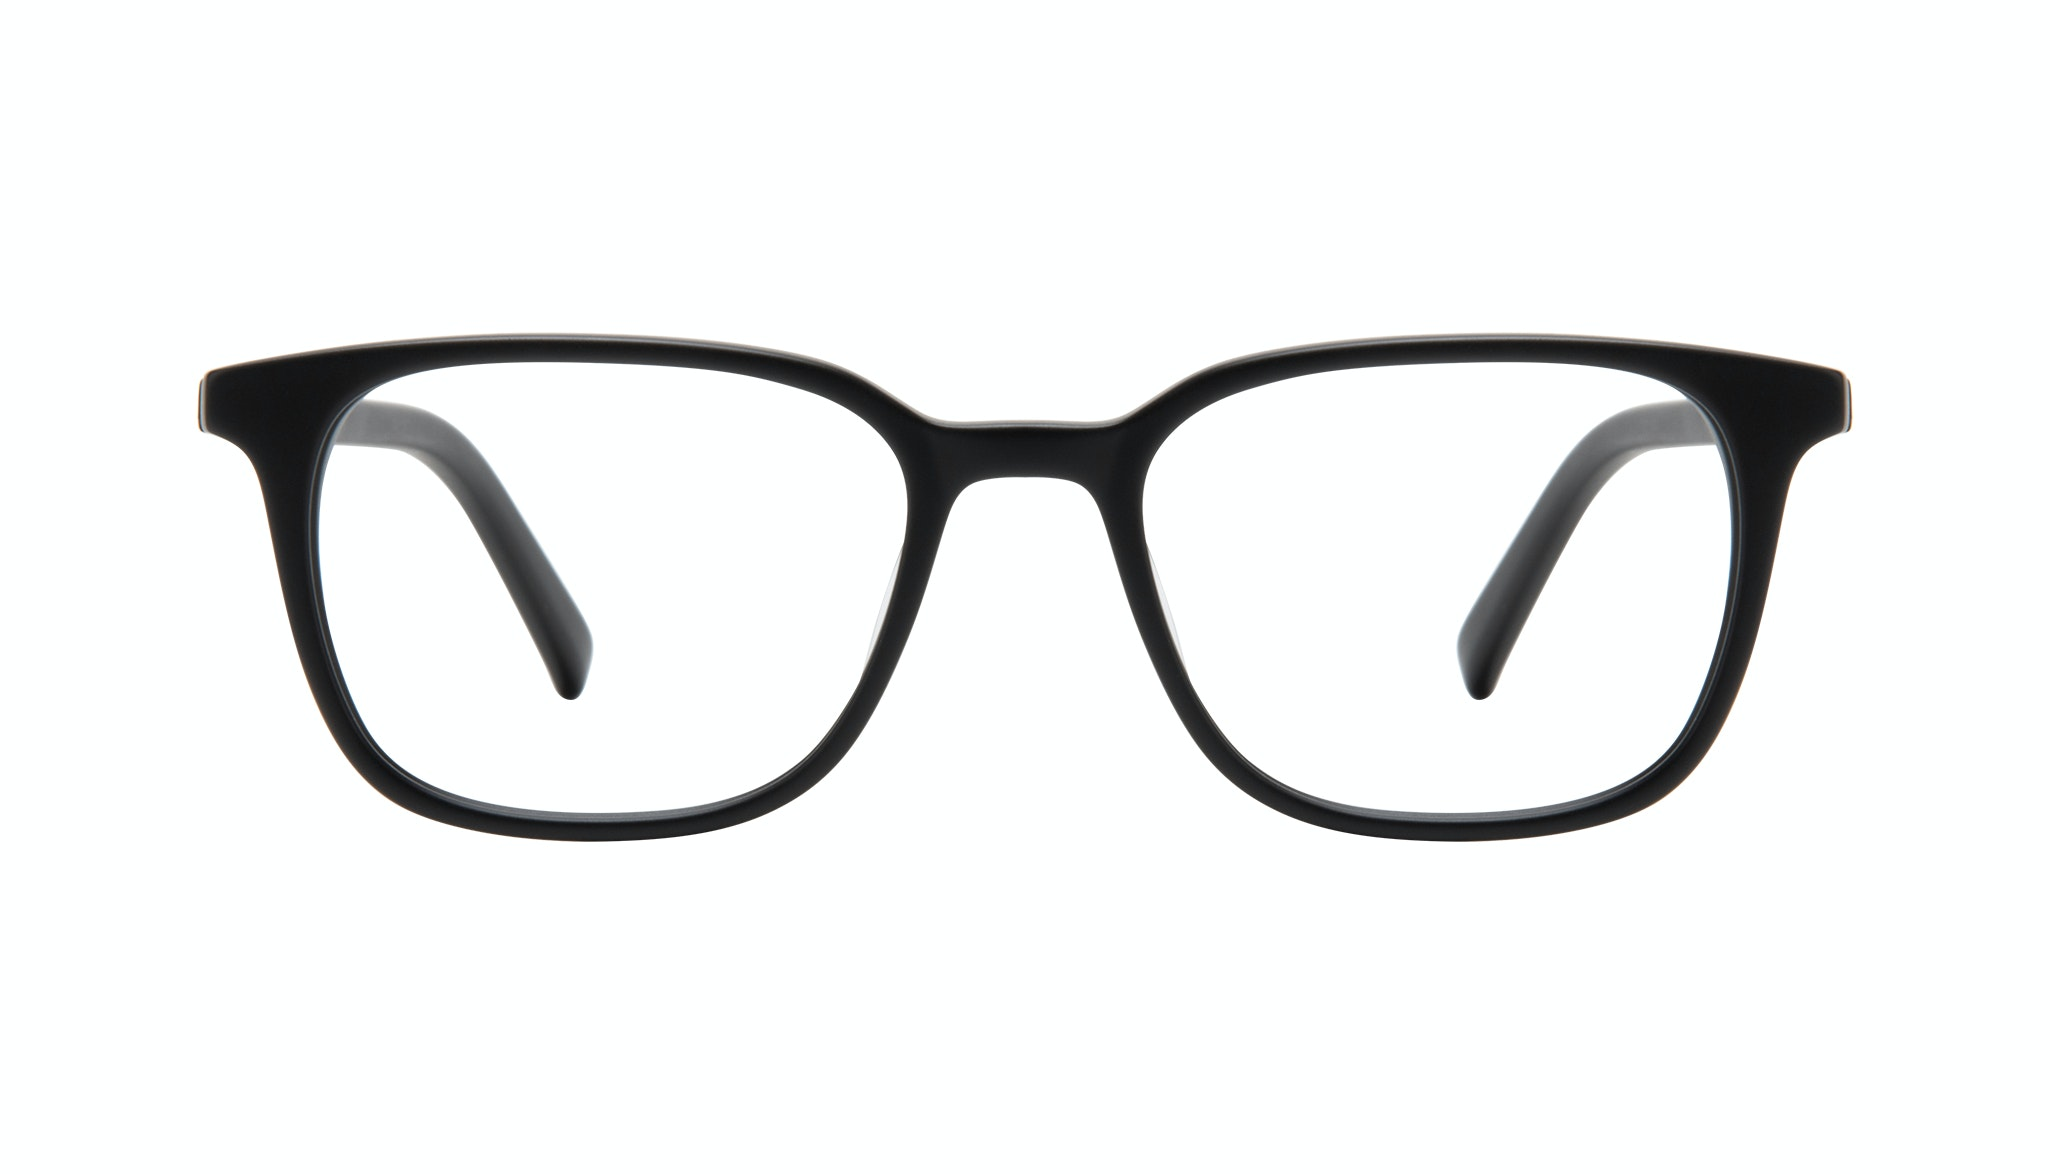 Affordable Fashion Glasses Square Eyeglasses Men Choice Black Matte Front